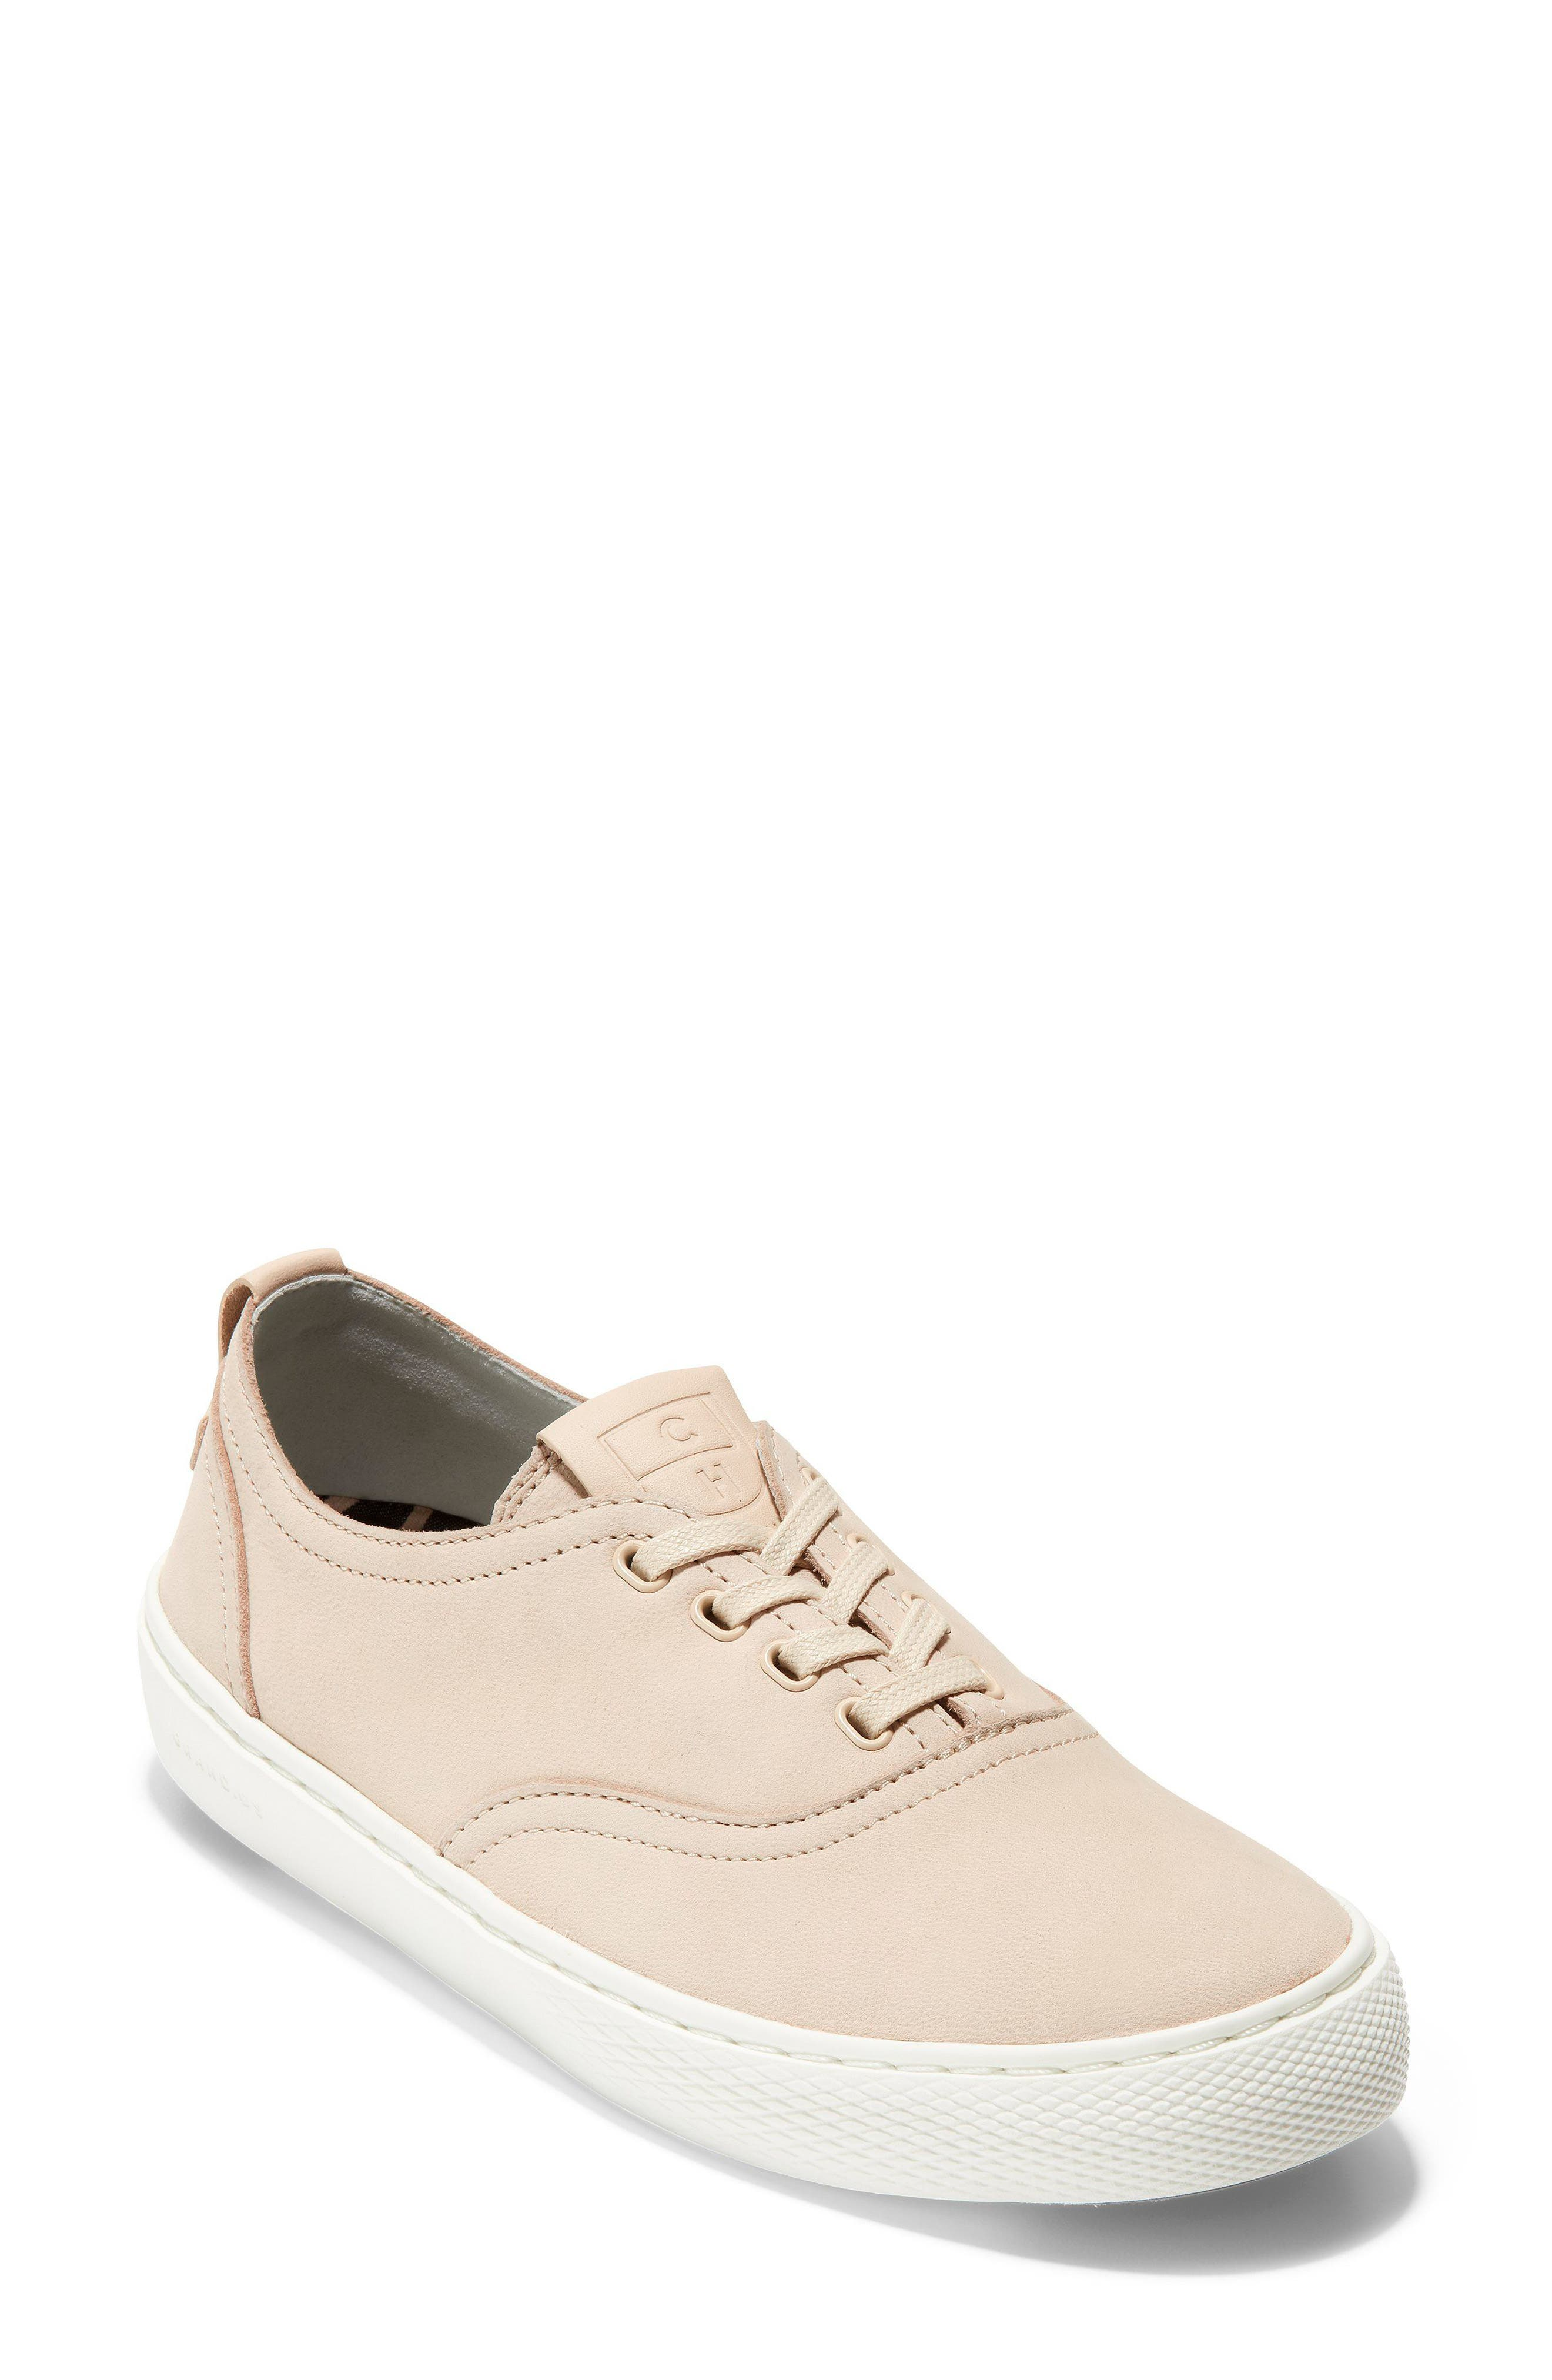 GrandPro Deck Sneaker,                             Main thumbnail 1, color,                             250